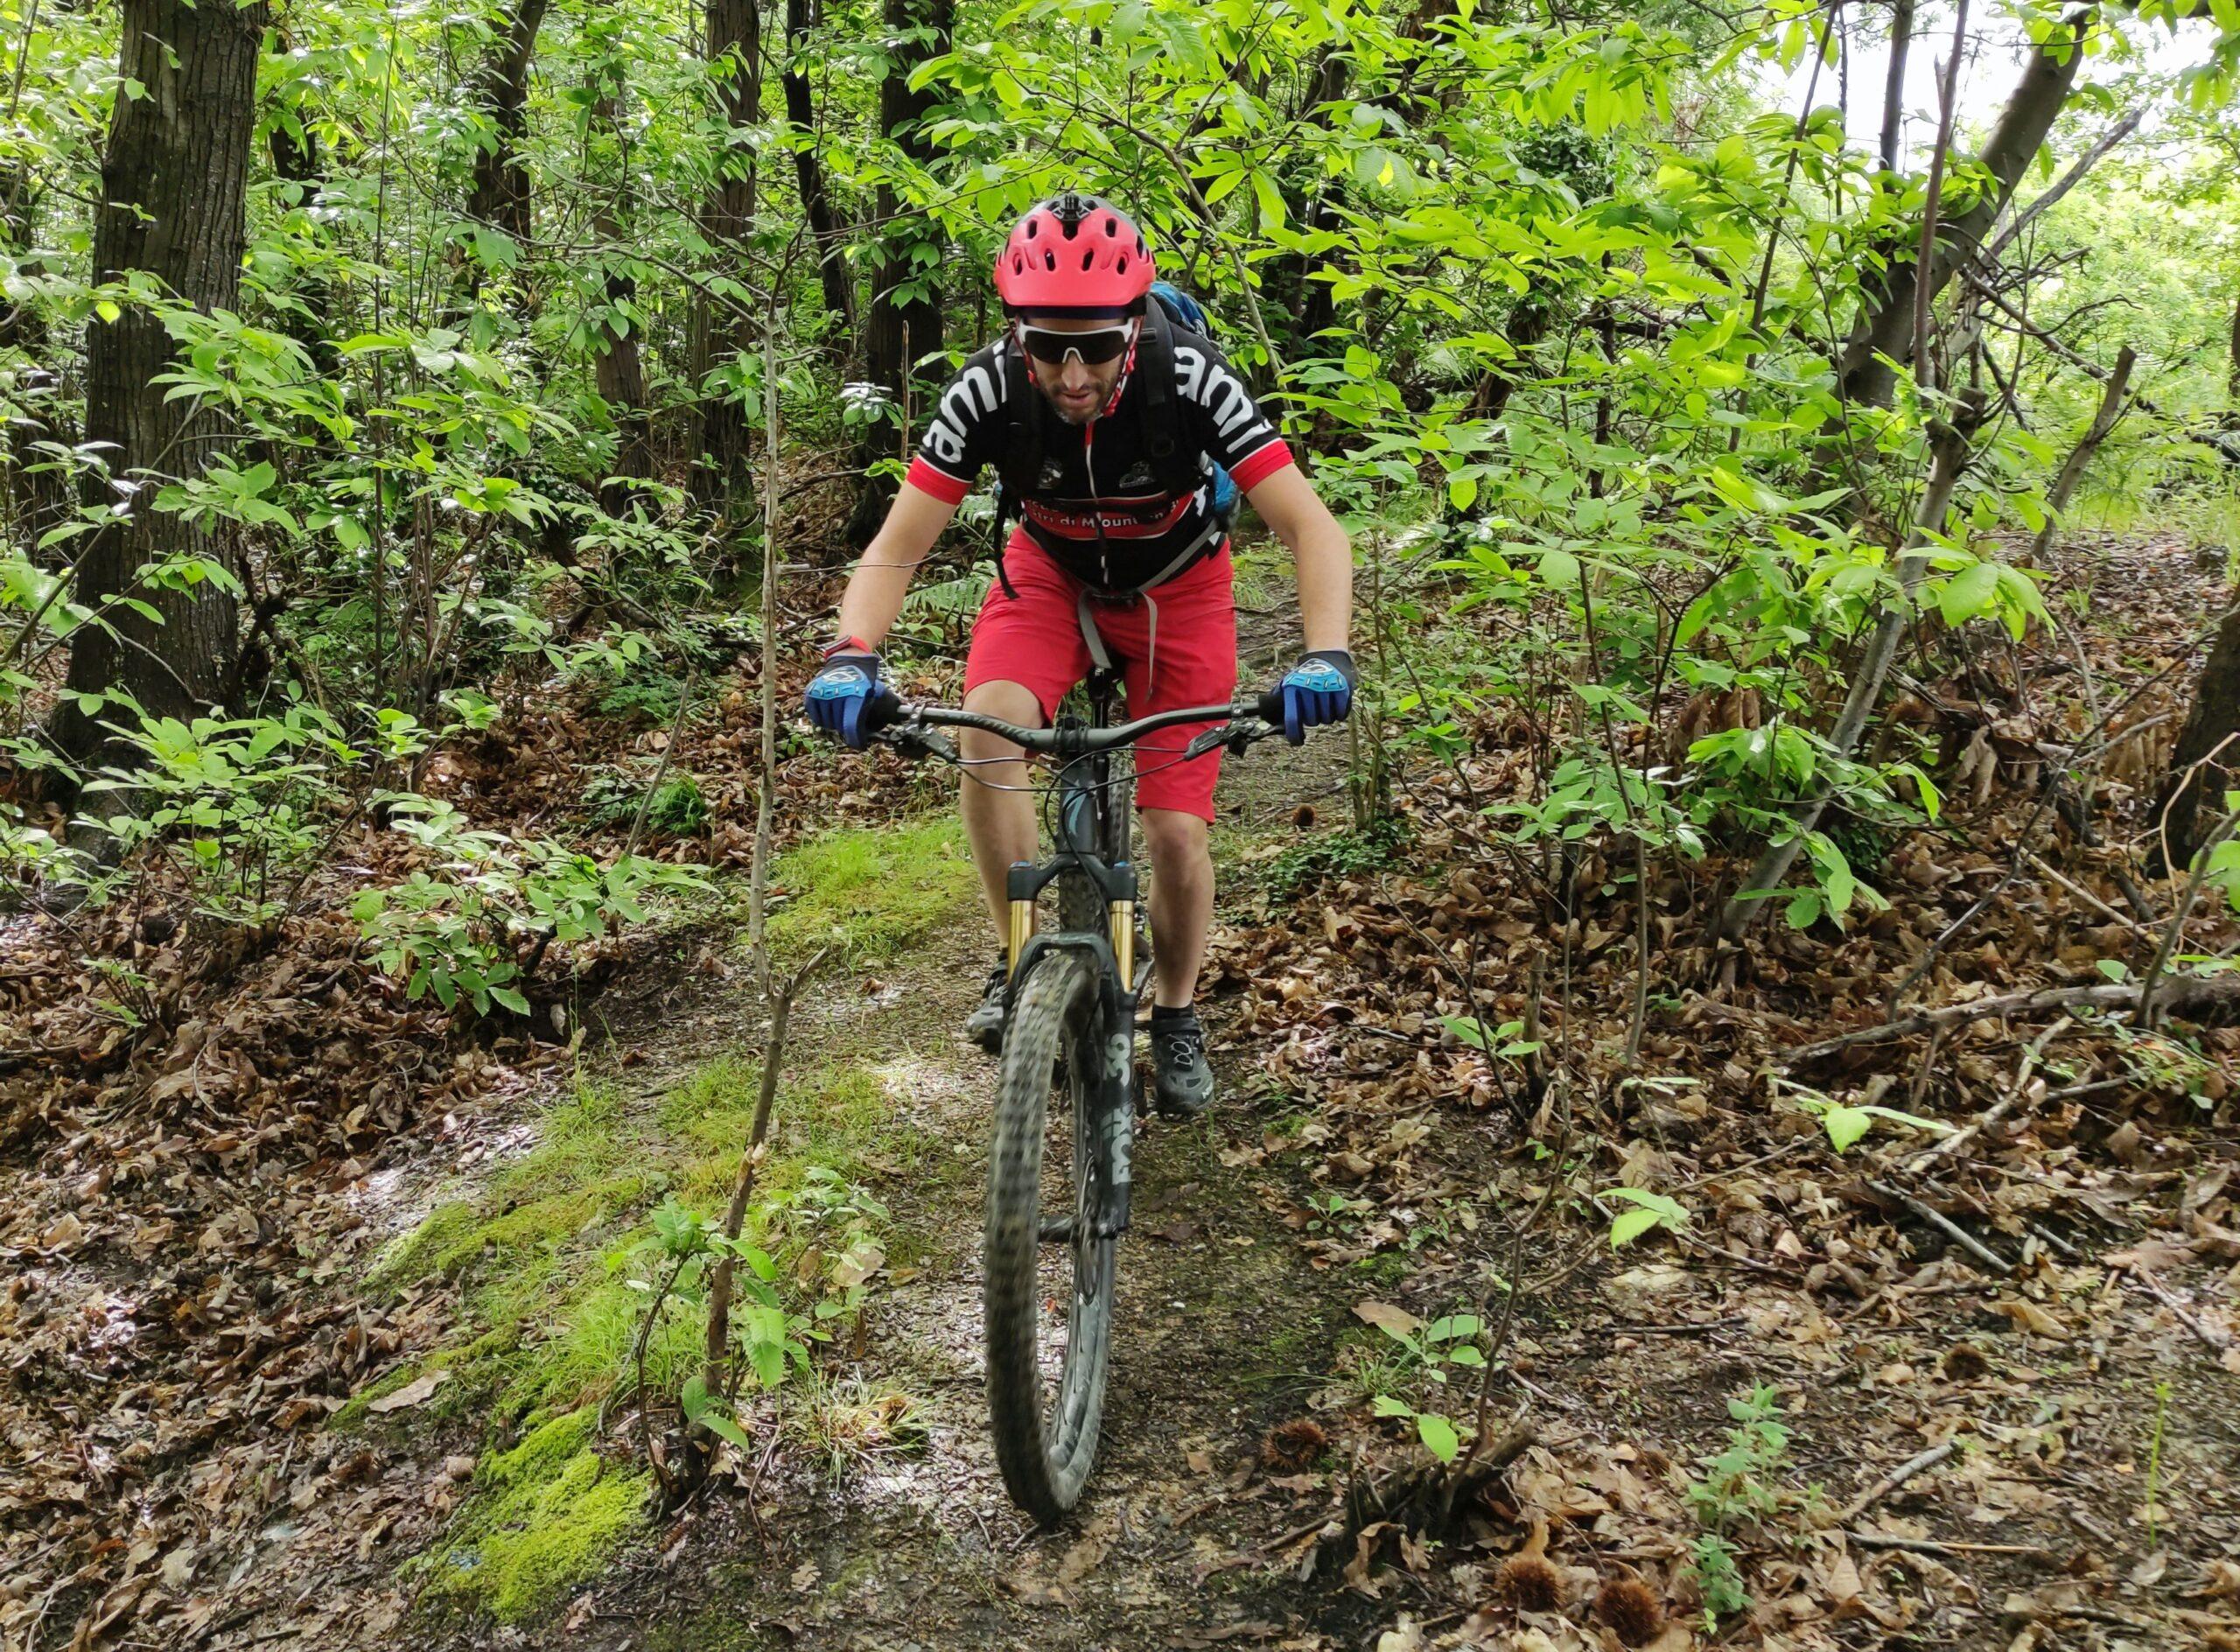 23 Ottobre 2021 – Lezione di mountain bike ed ebike per adulti